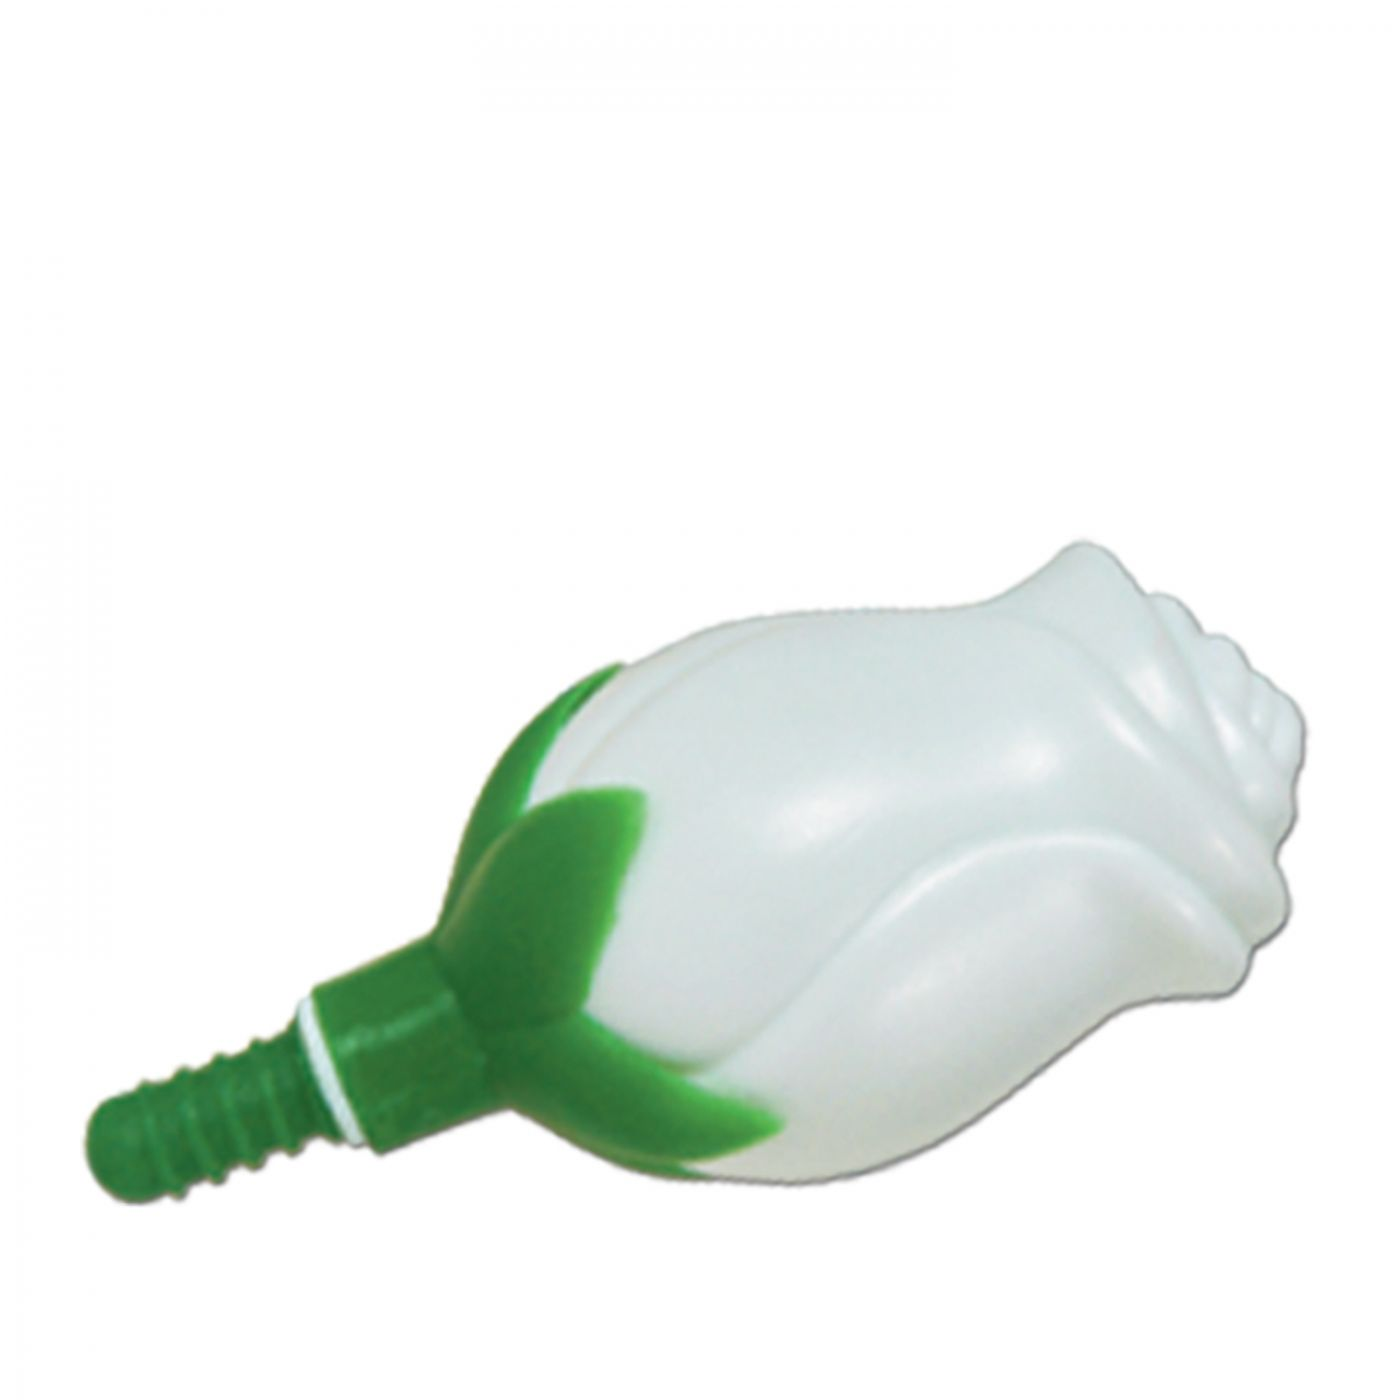 Rosebud Bubbles (1) image